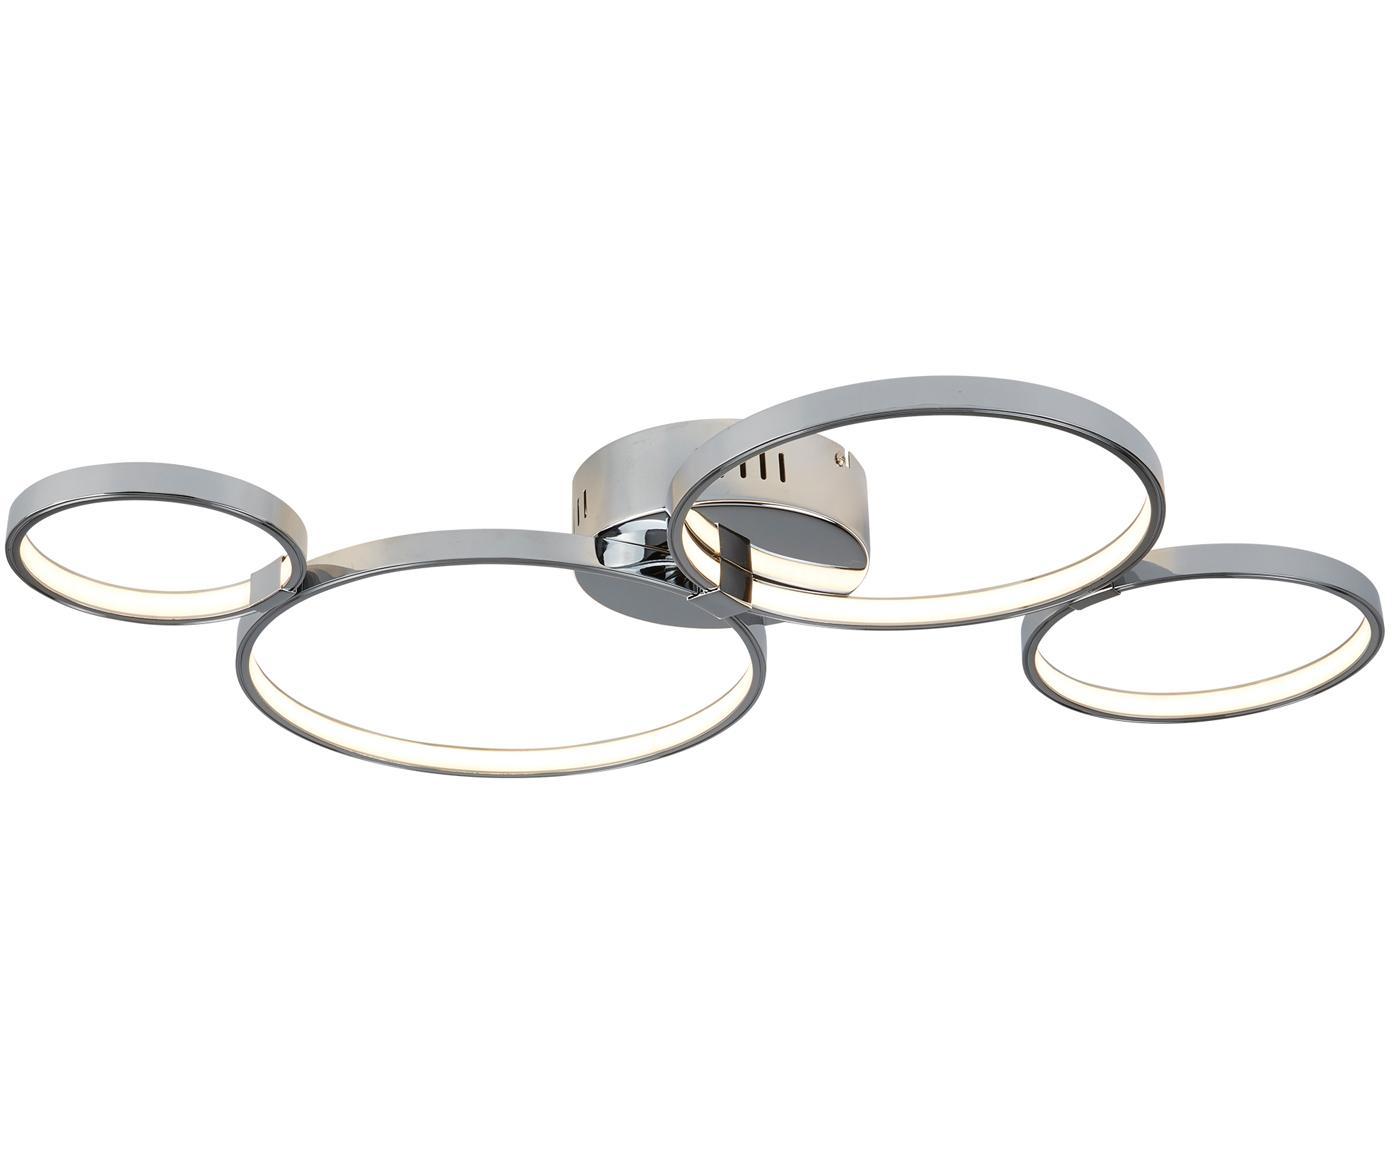 Plafoniera a LED Solexa, Metallo cromato, Cromo, Larg. 75 x Alt. 7 cm